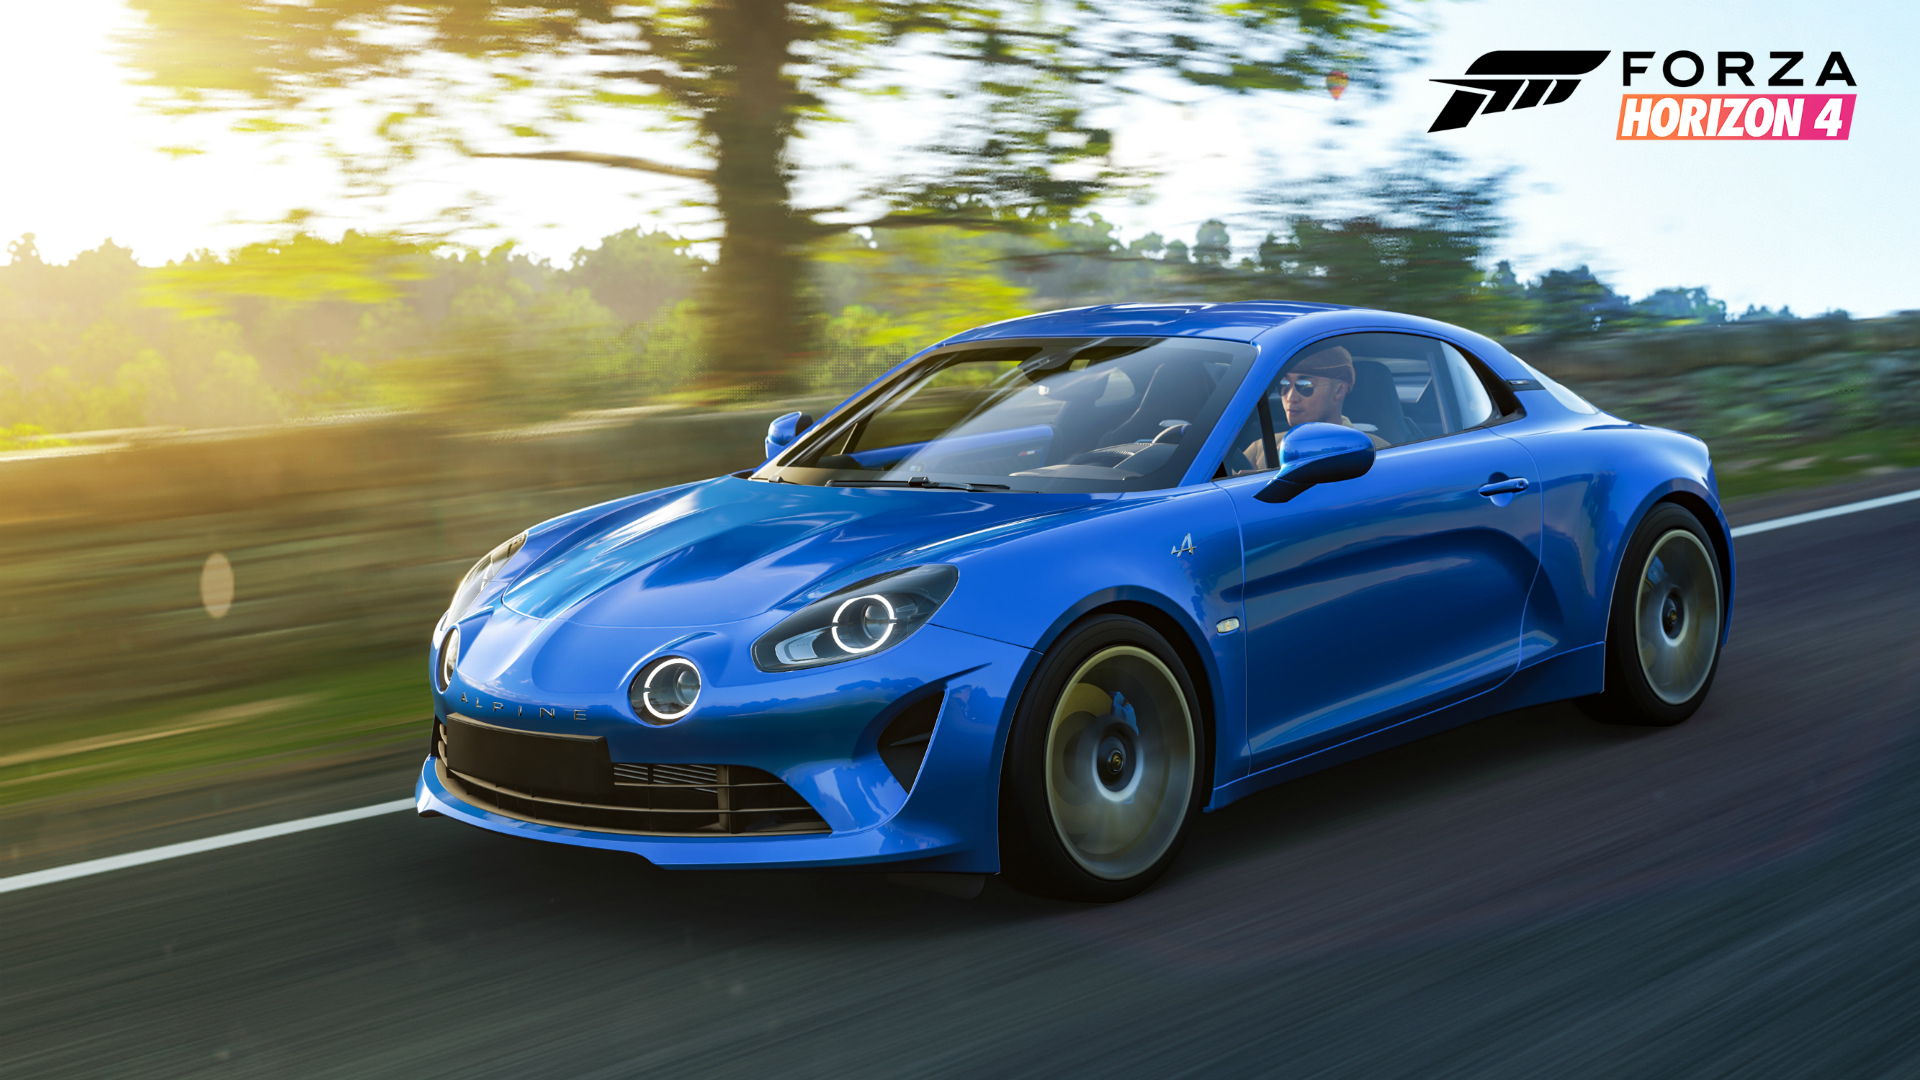 2017 Alpine A110.jpg - Forza Horizon 4